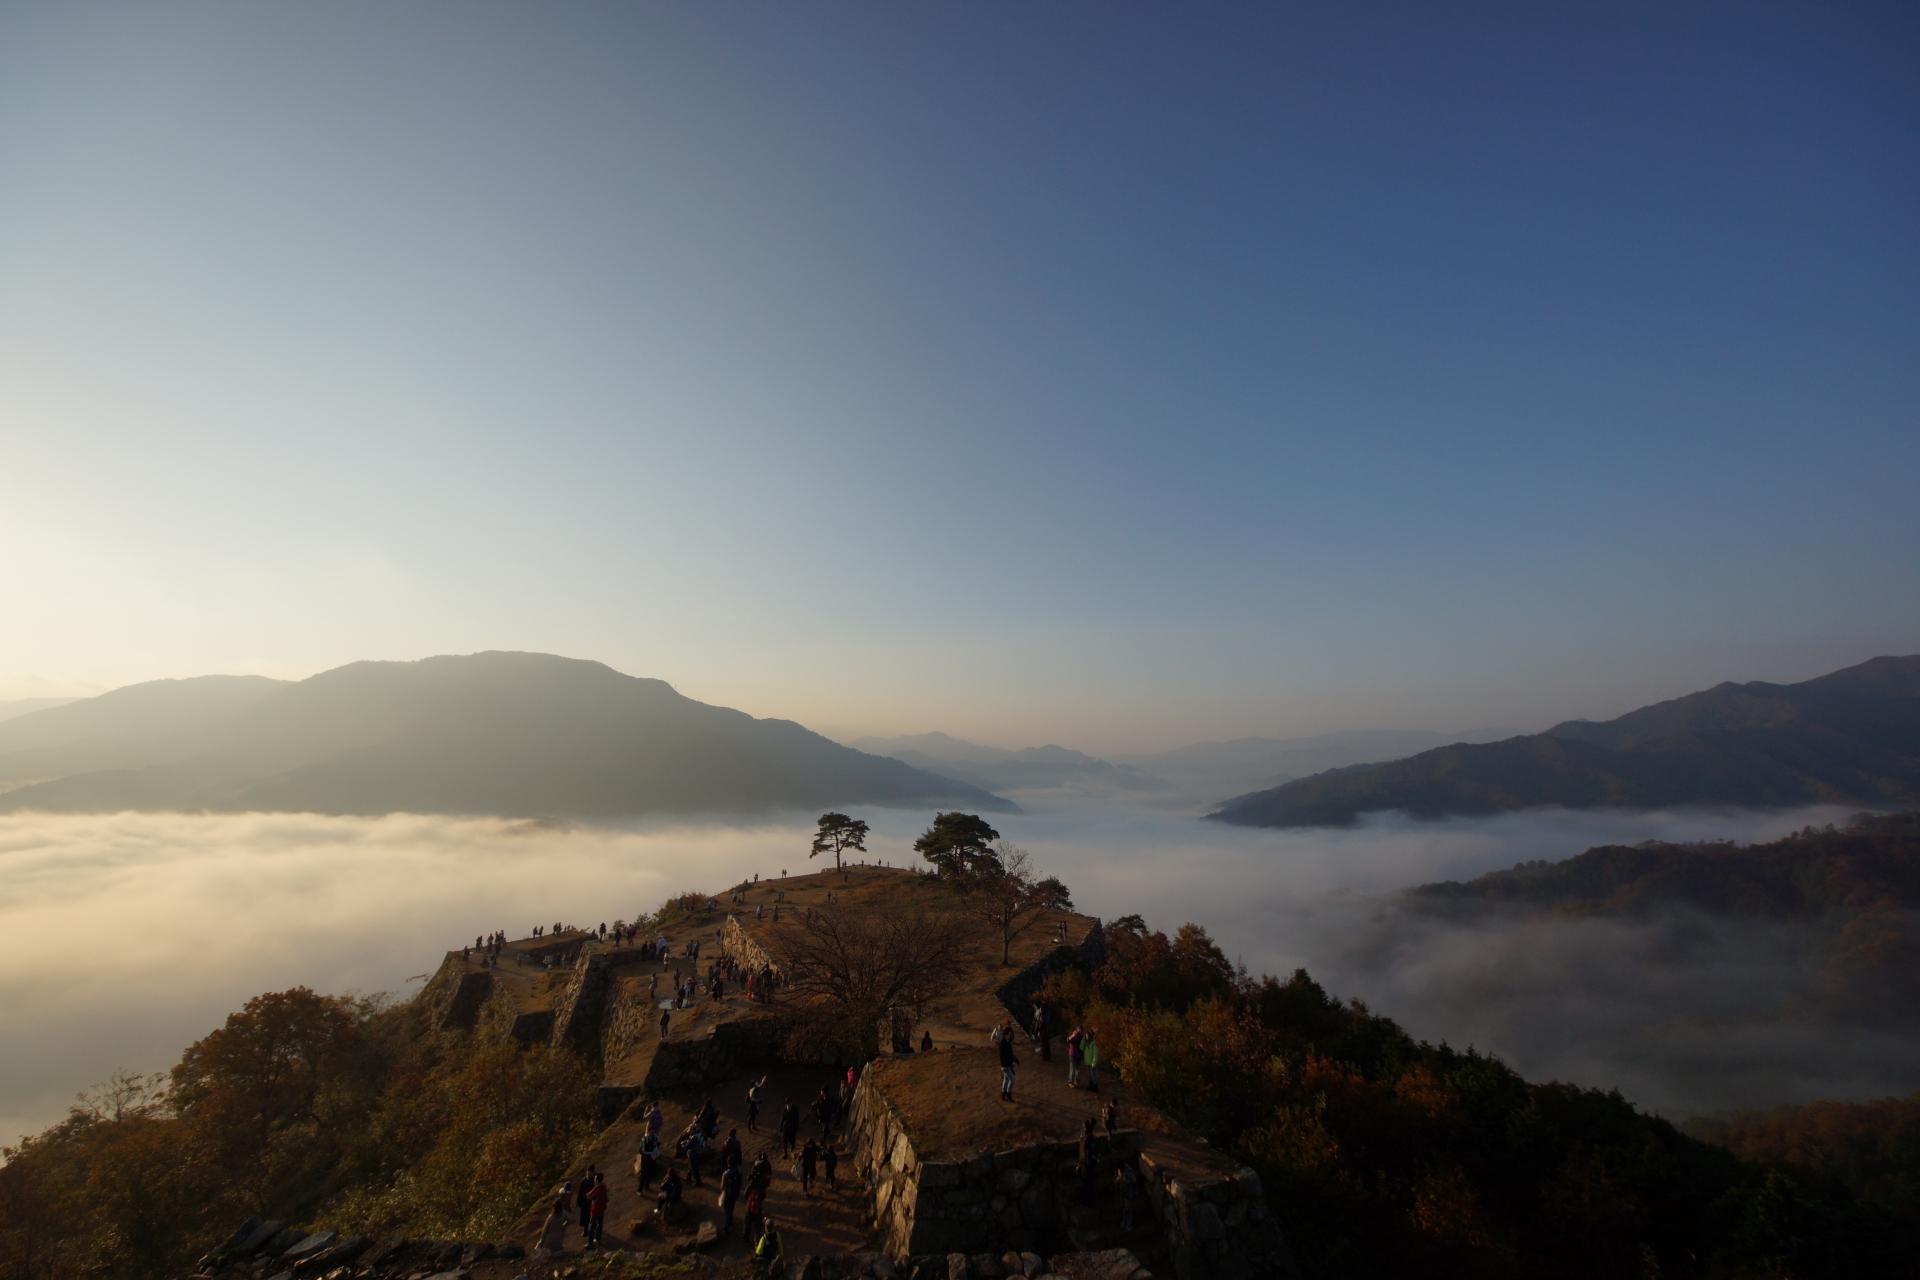 509822_m 兵庫県 竹田城(雲海に包まれる秋におすすめの絶景写真スポット!アクセス情報や雲海の発生条件など)